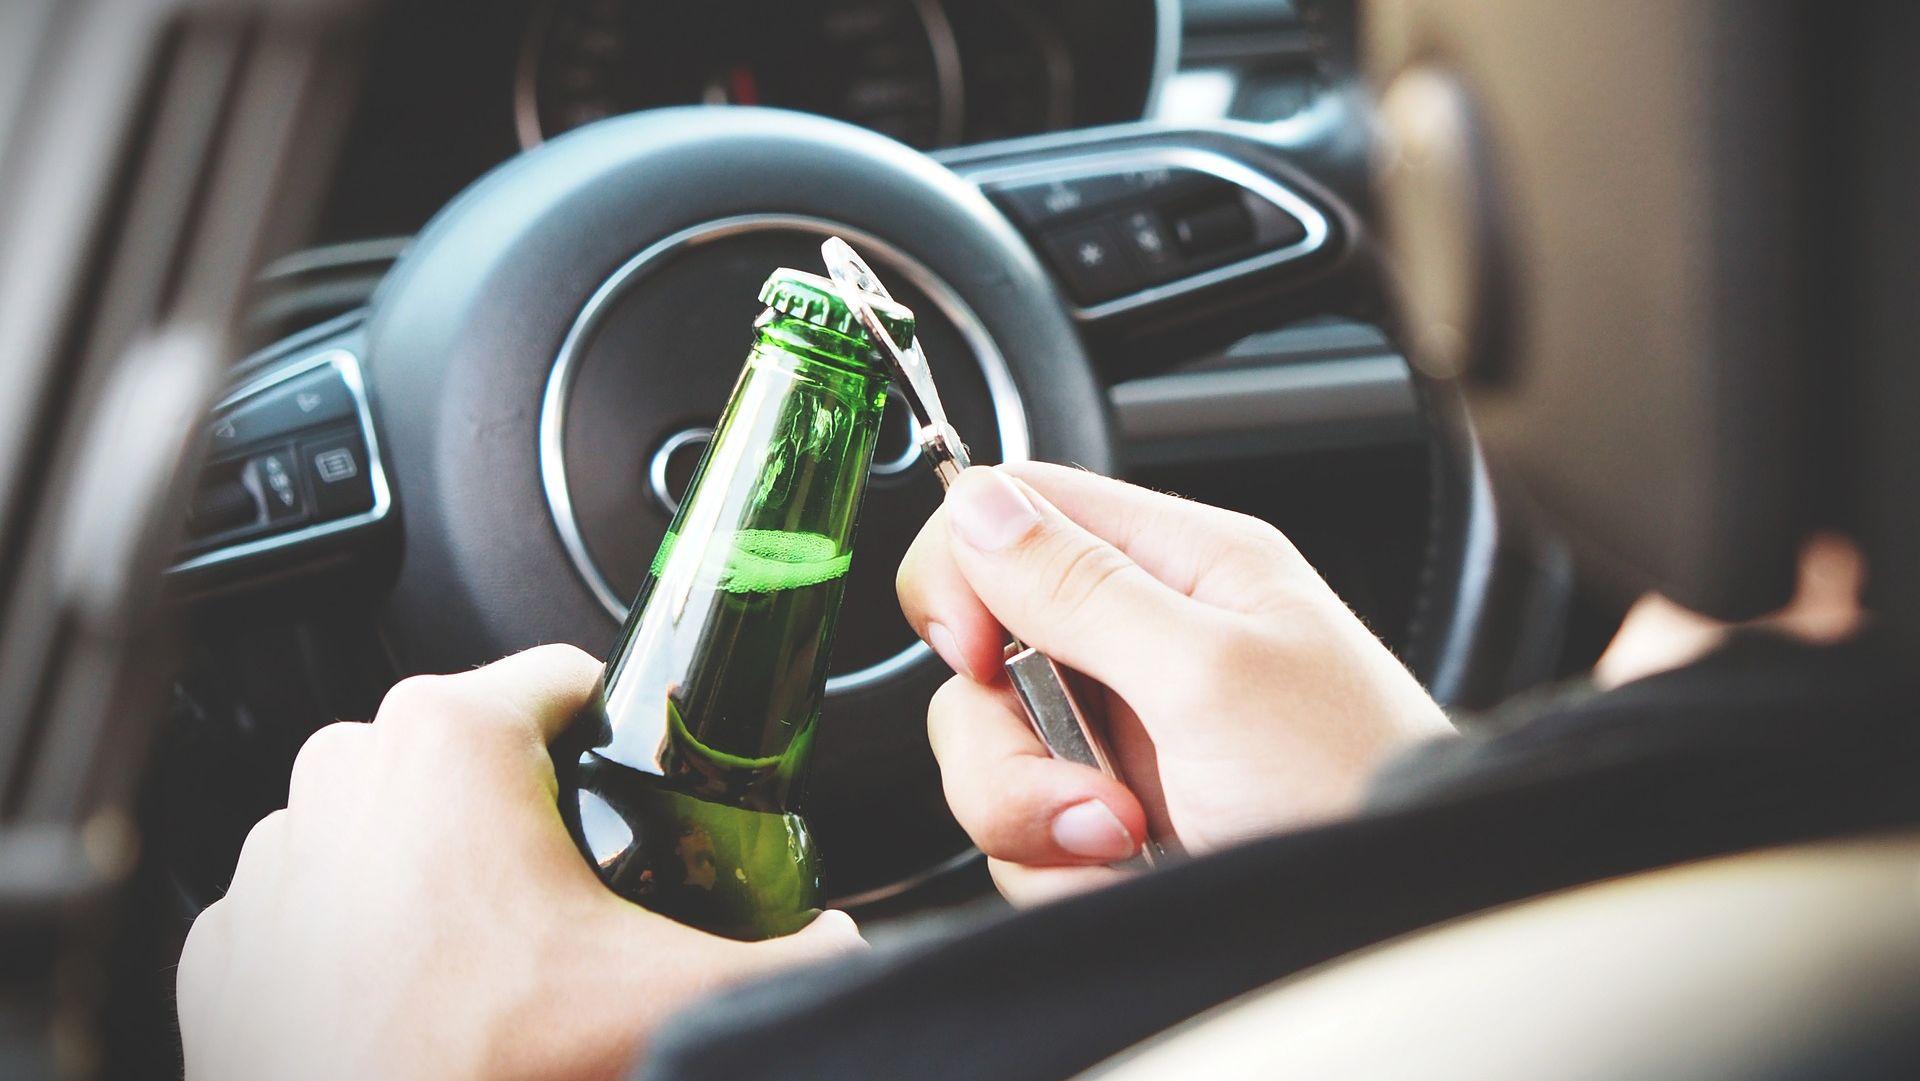 'REKORDER' IZ JAŠKOVA 32-godišnjak vozio s 4.61 promila alkohola u krvi